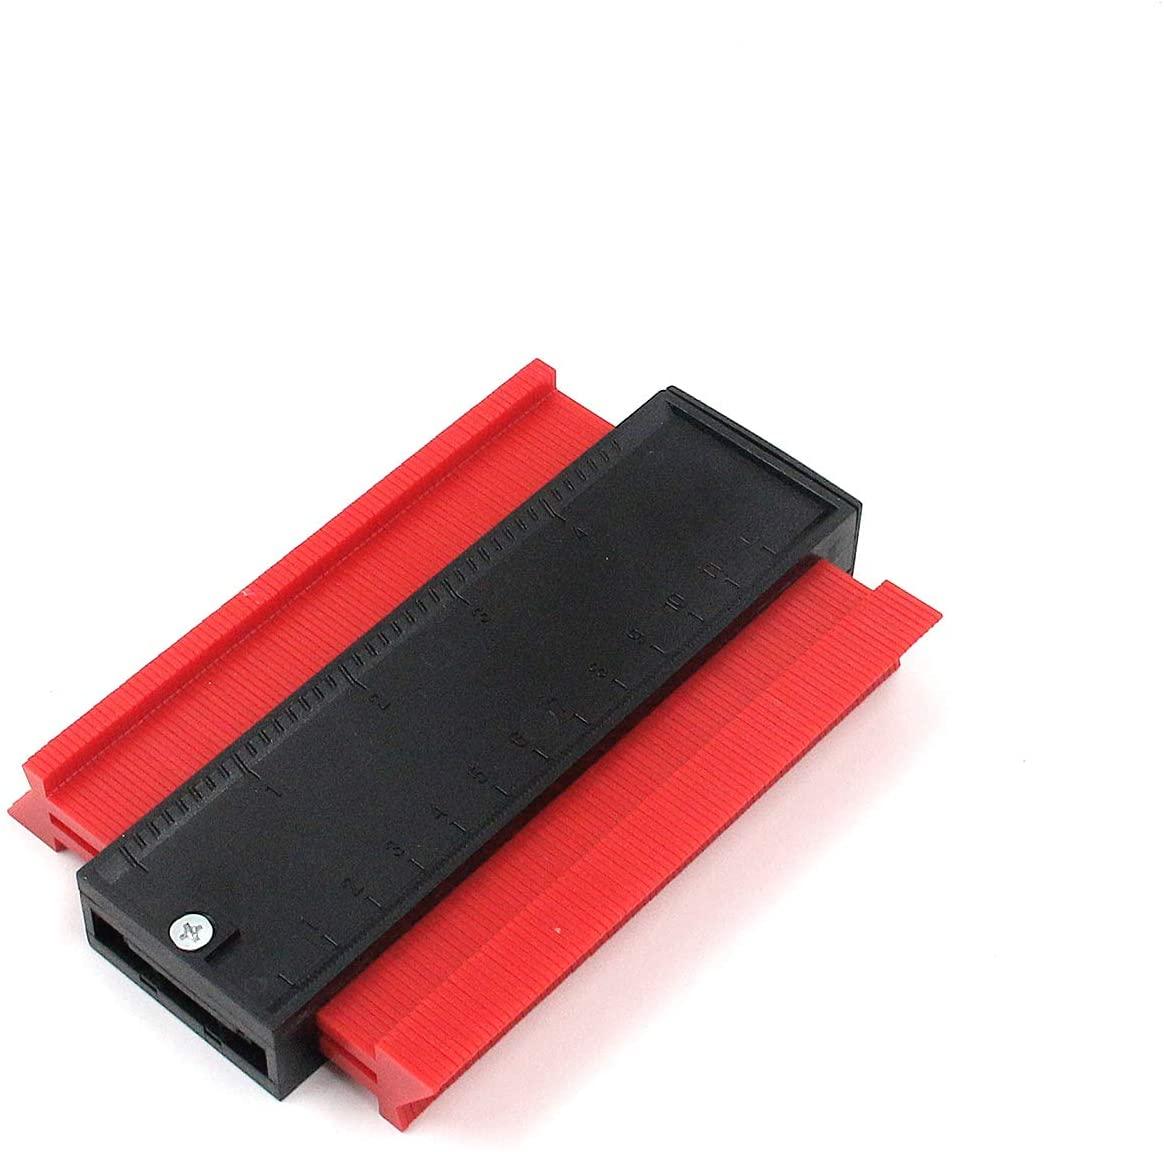 Tulead Red Contour Gauge Plastic Profile Guage Various Shape Contour Gauge Duplicator 5-Inch Woodworking Measurement Tool